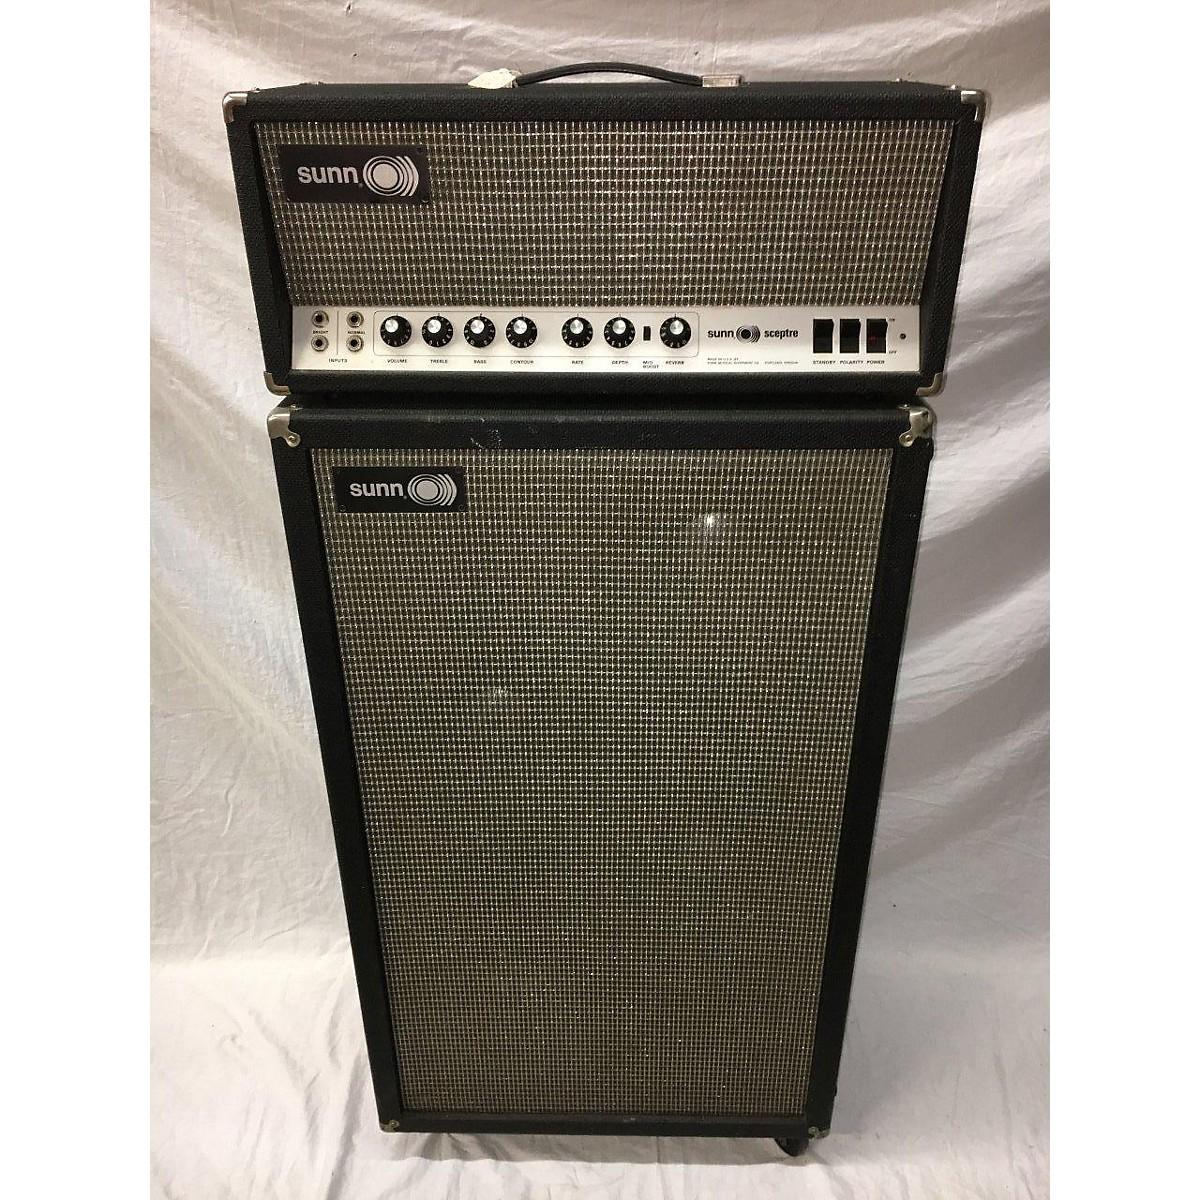 Sunn 1970 SCEPTRE AMP WITH CABINET Tube Guitar Amp Head